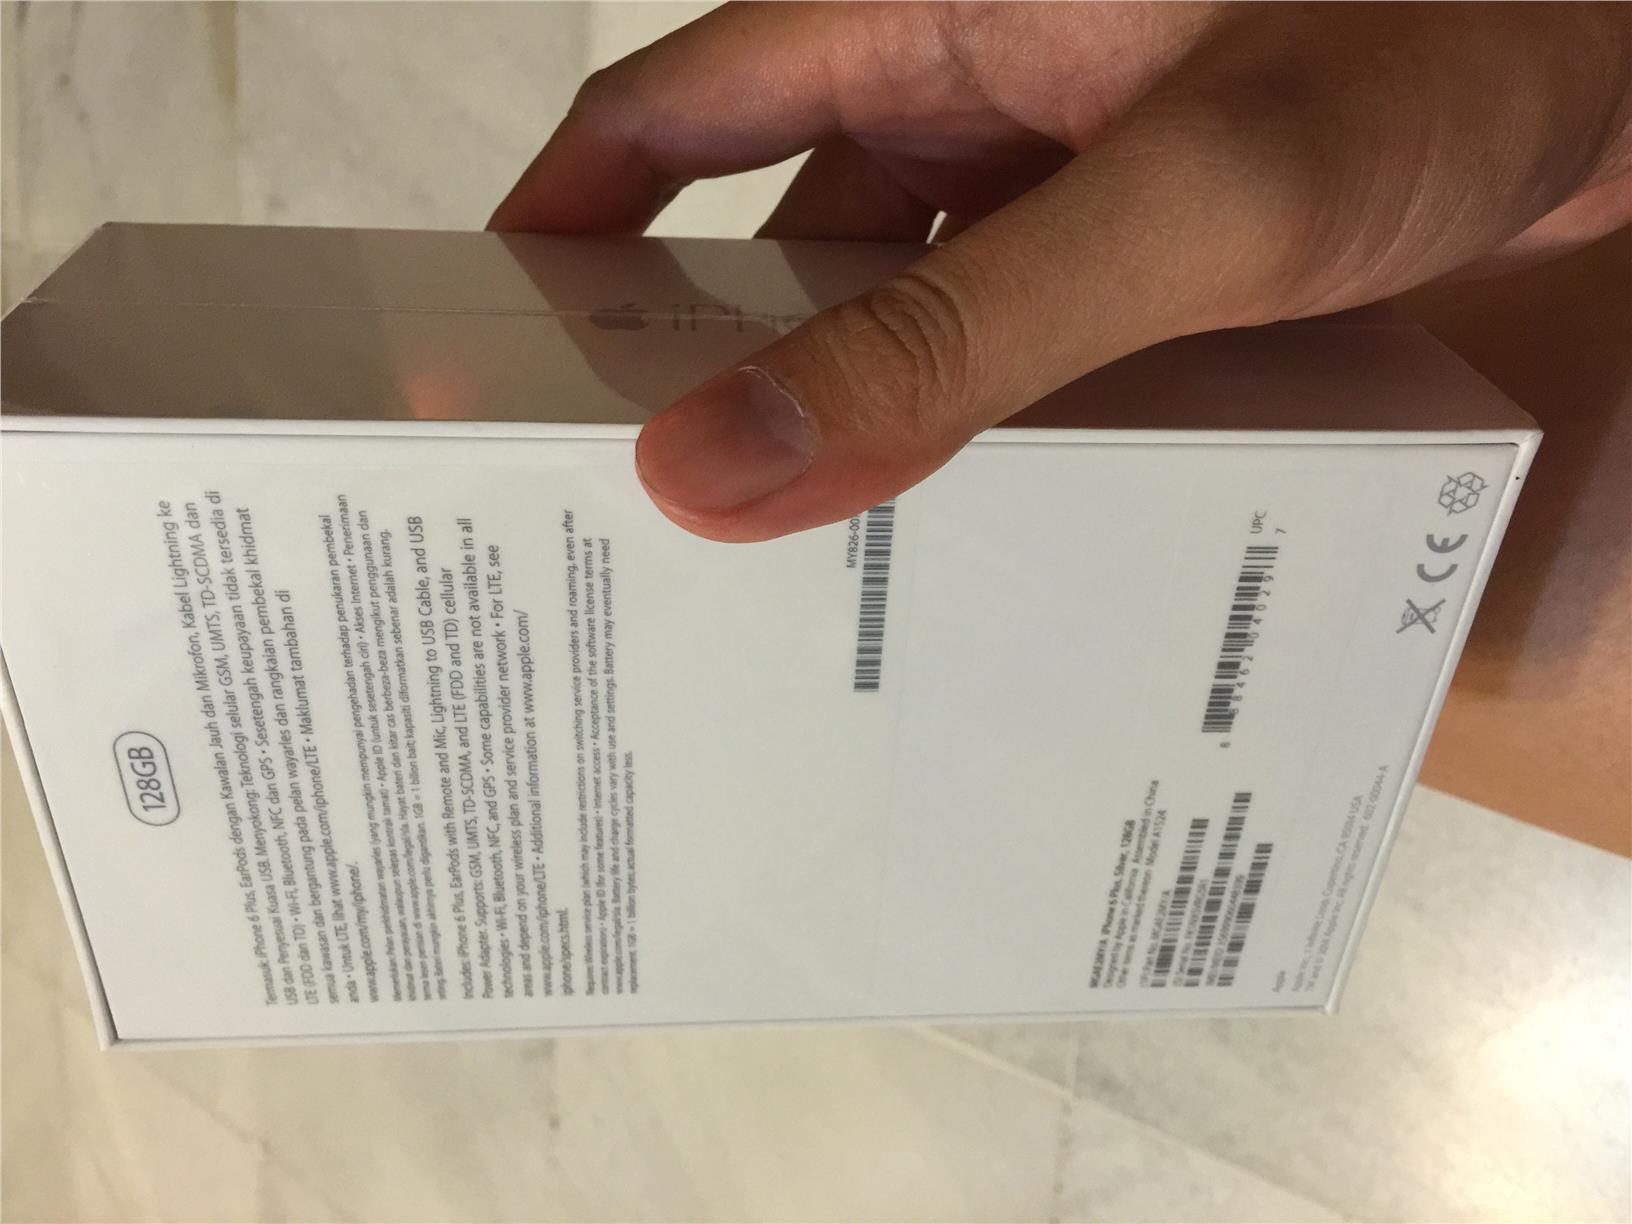 iphone 6 silver box. apple iphone 6 plus 128gb silver brand new malaysia iphone box